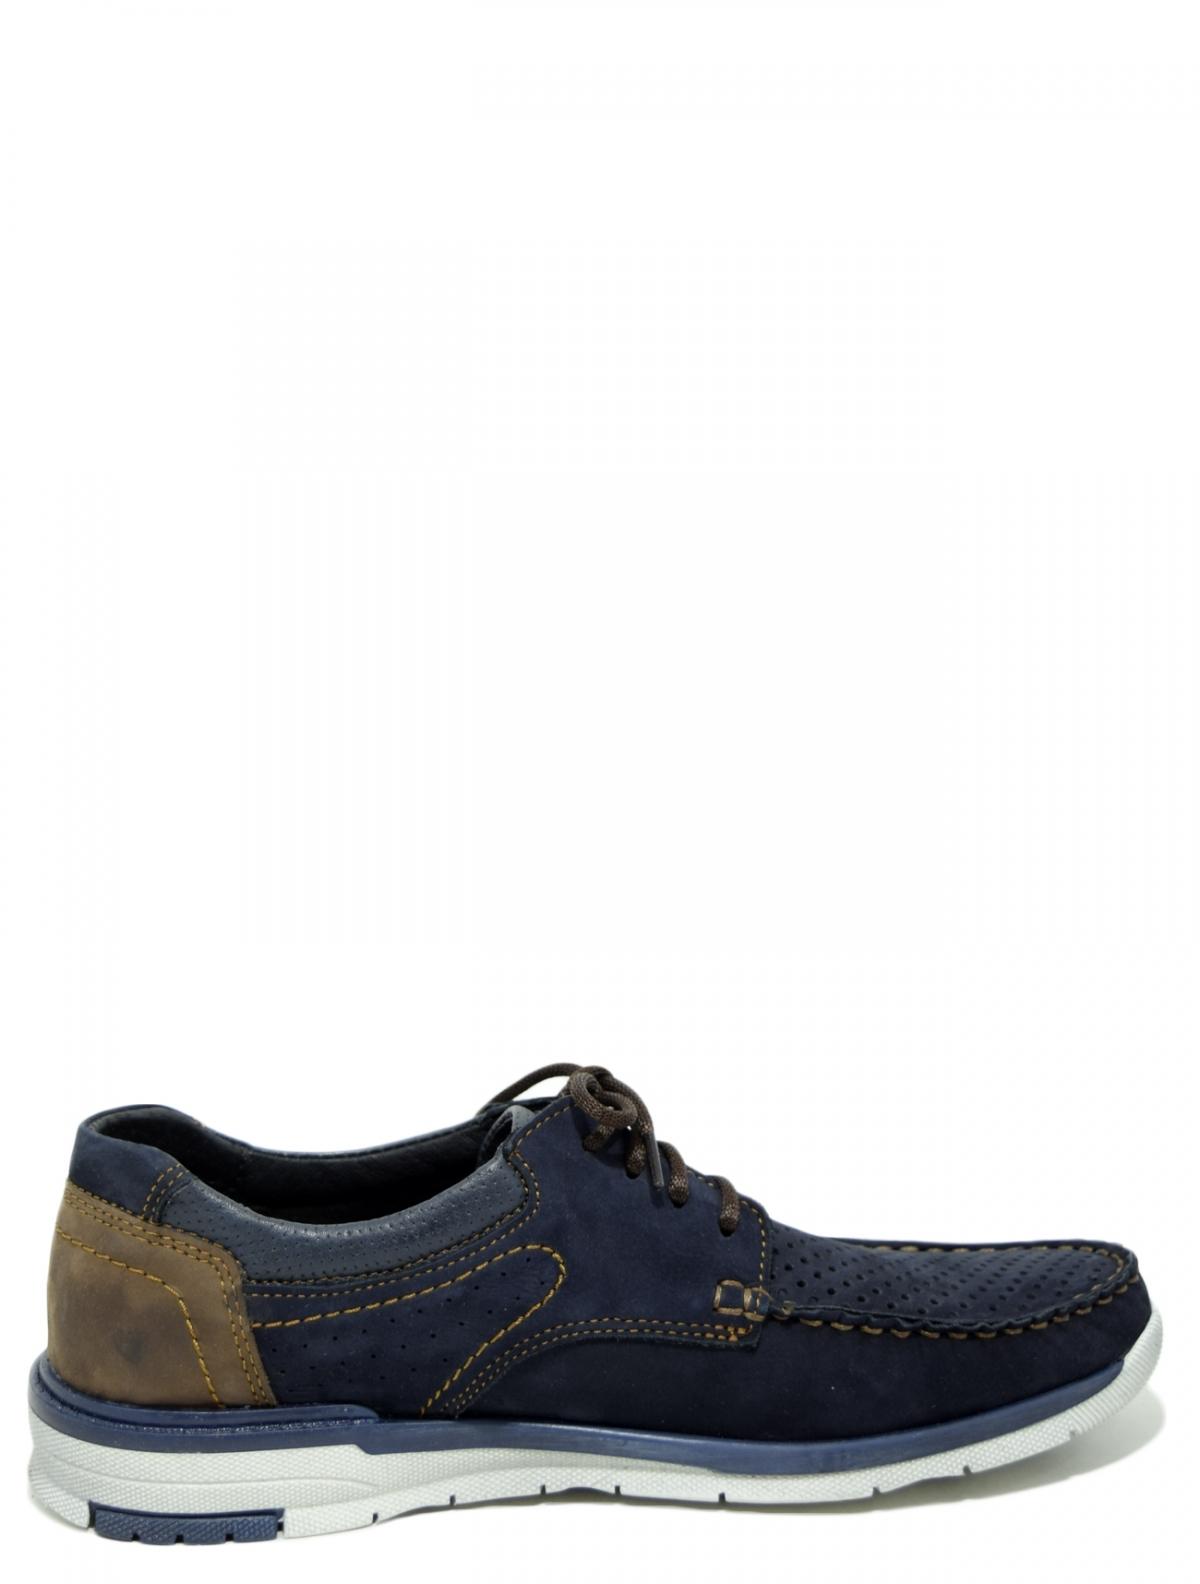 Rooman 902-121-N3N мужские ботинки